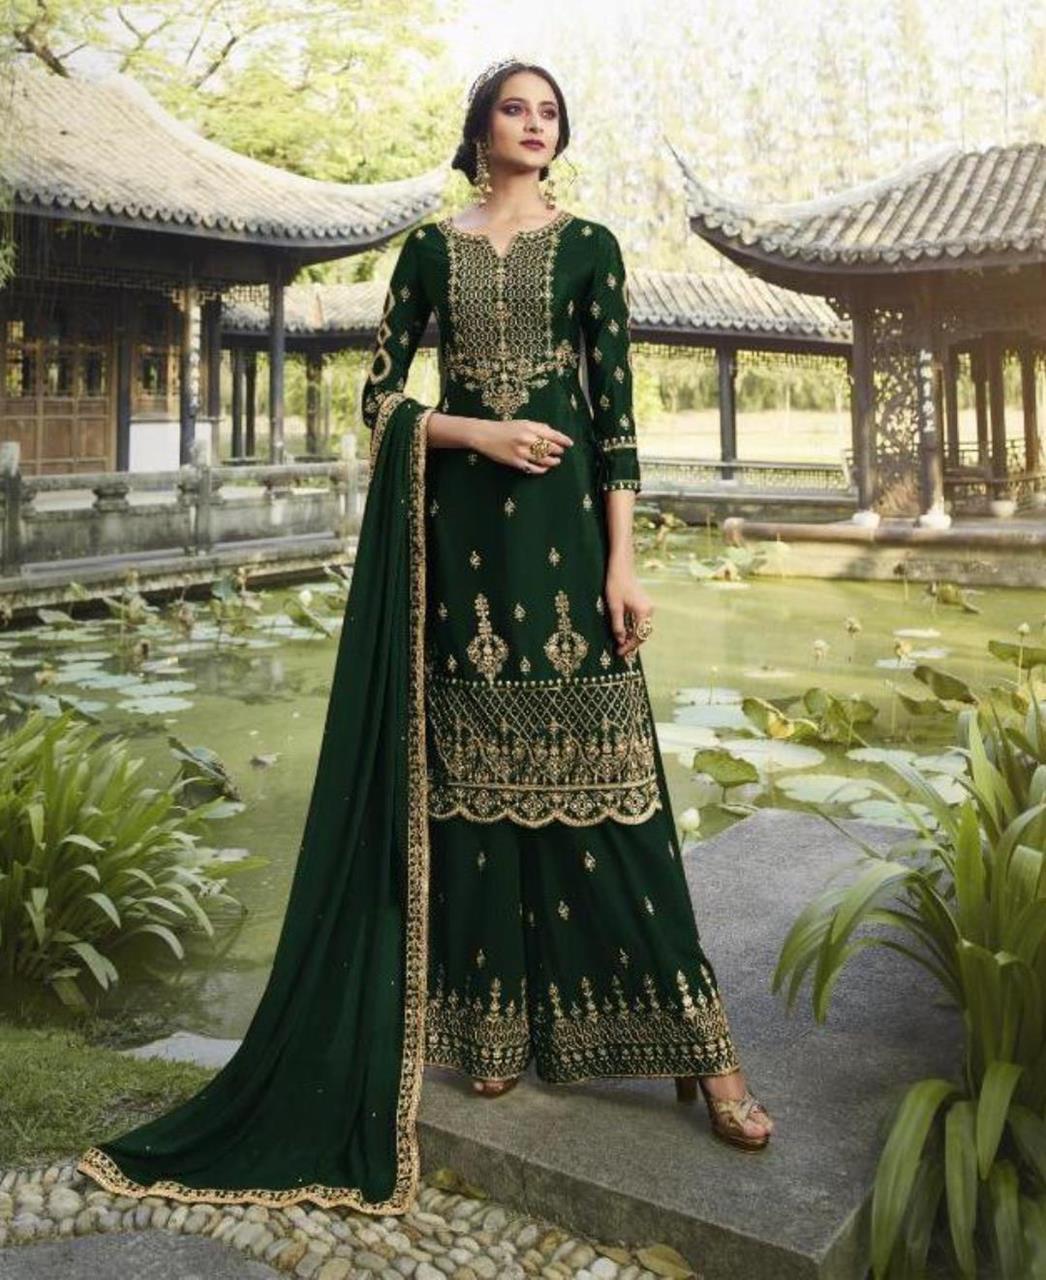 HandWorked Georgette Straight cut Salwar Kameez in Green